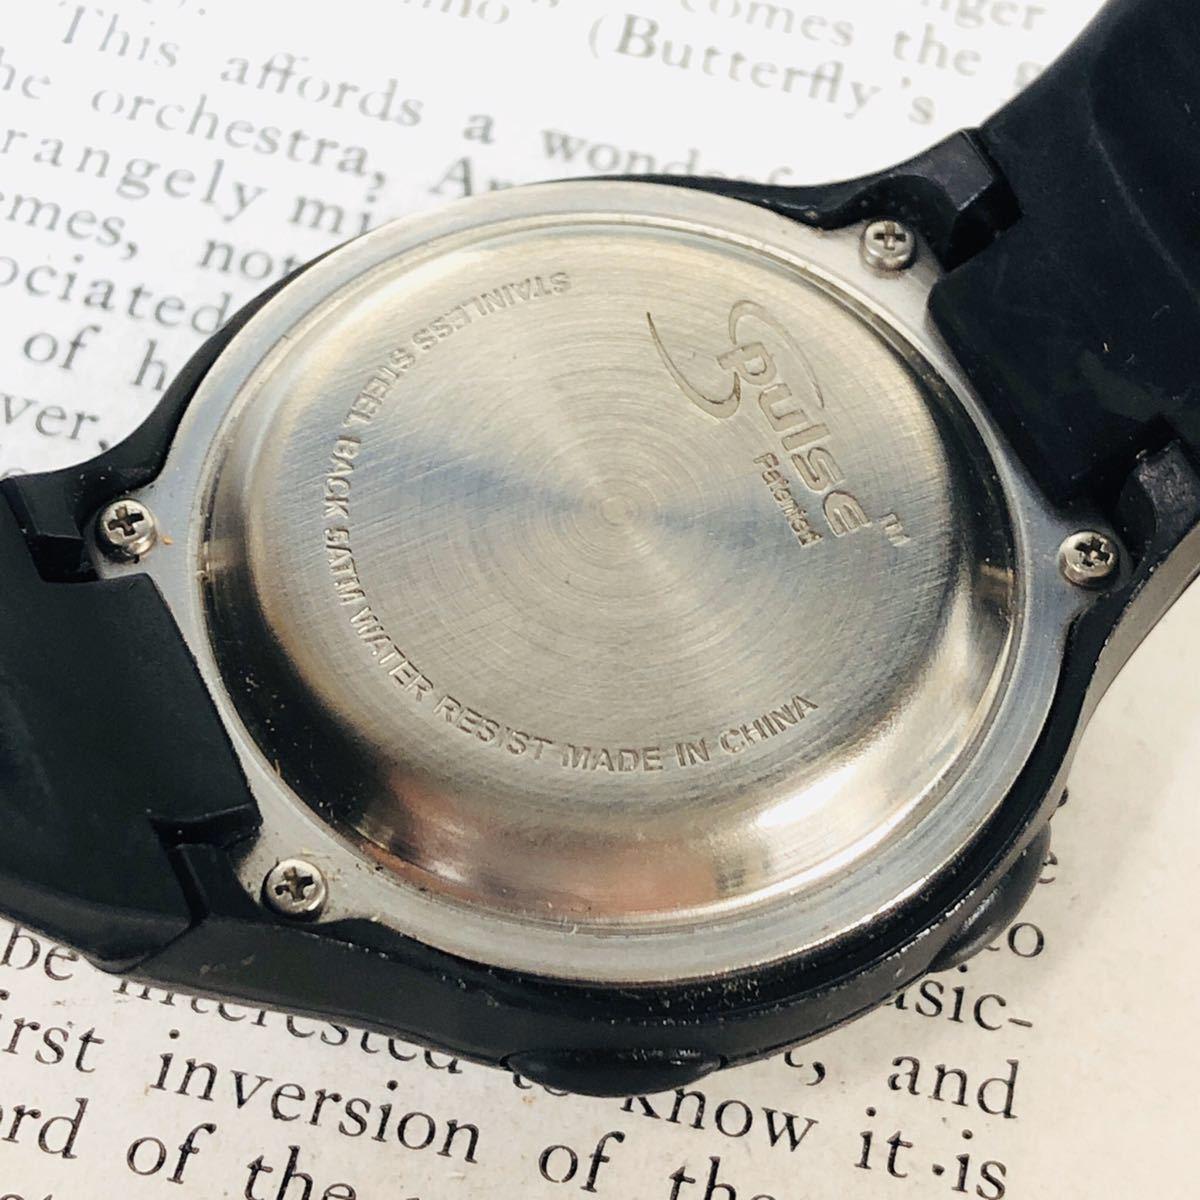 Reebok リーボック 腕時計 マットサテンシルバーカラー ブラック 心拍計 クロノ タイマー デジタル 稼動品 W730_画像8